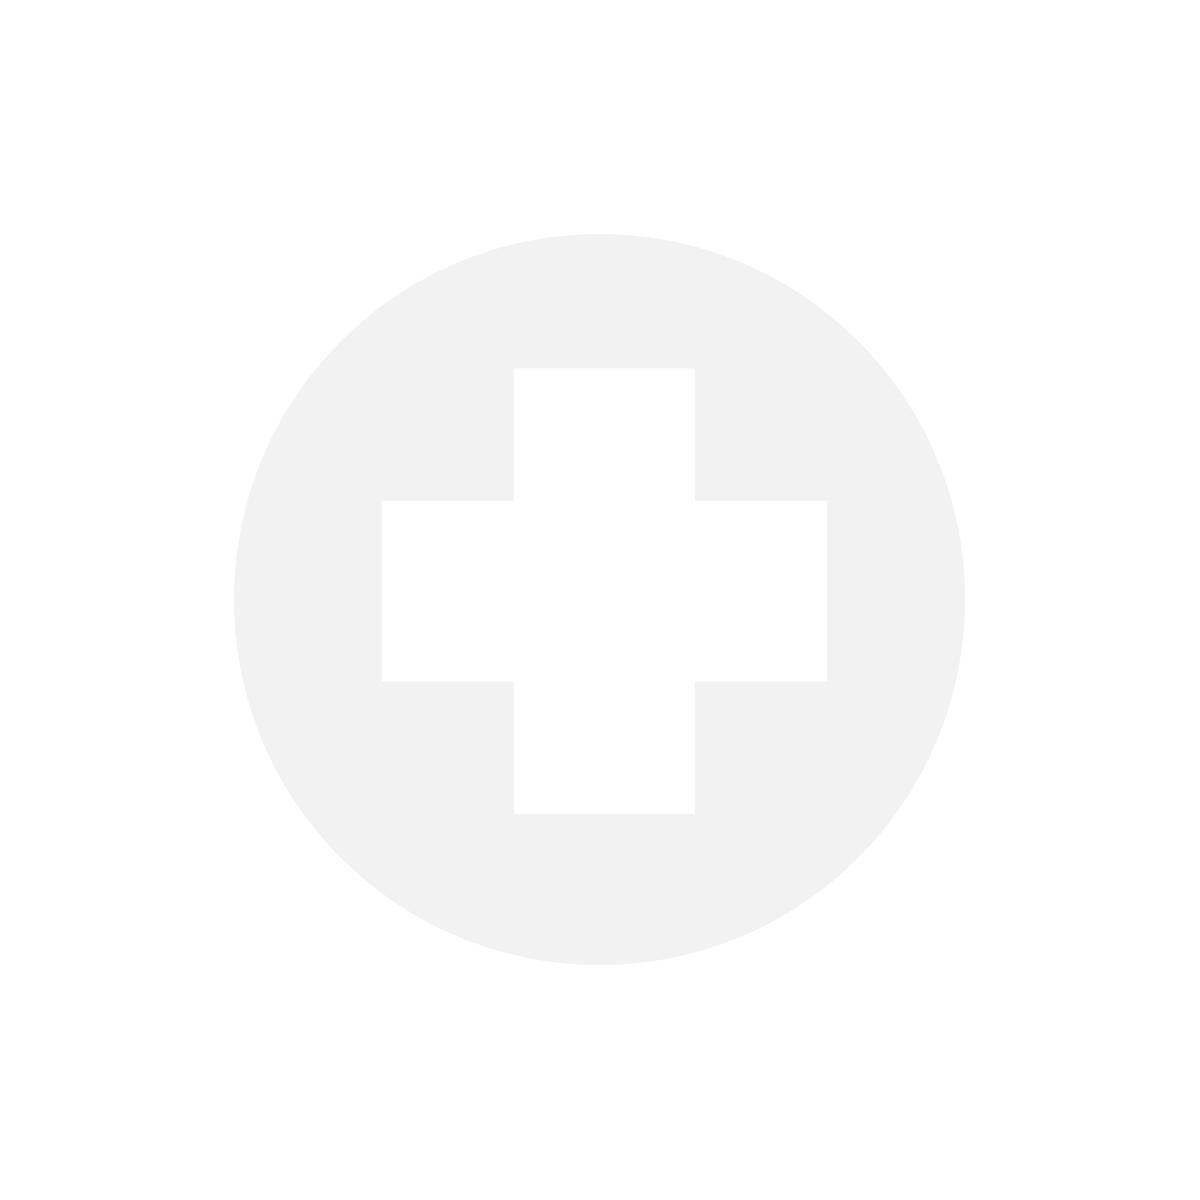 1 PhysioRhuma (250 ml) + 1 PhysioWarm (250 ml) + 1 PhysioArgile Chaude (130 ml)